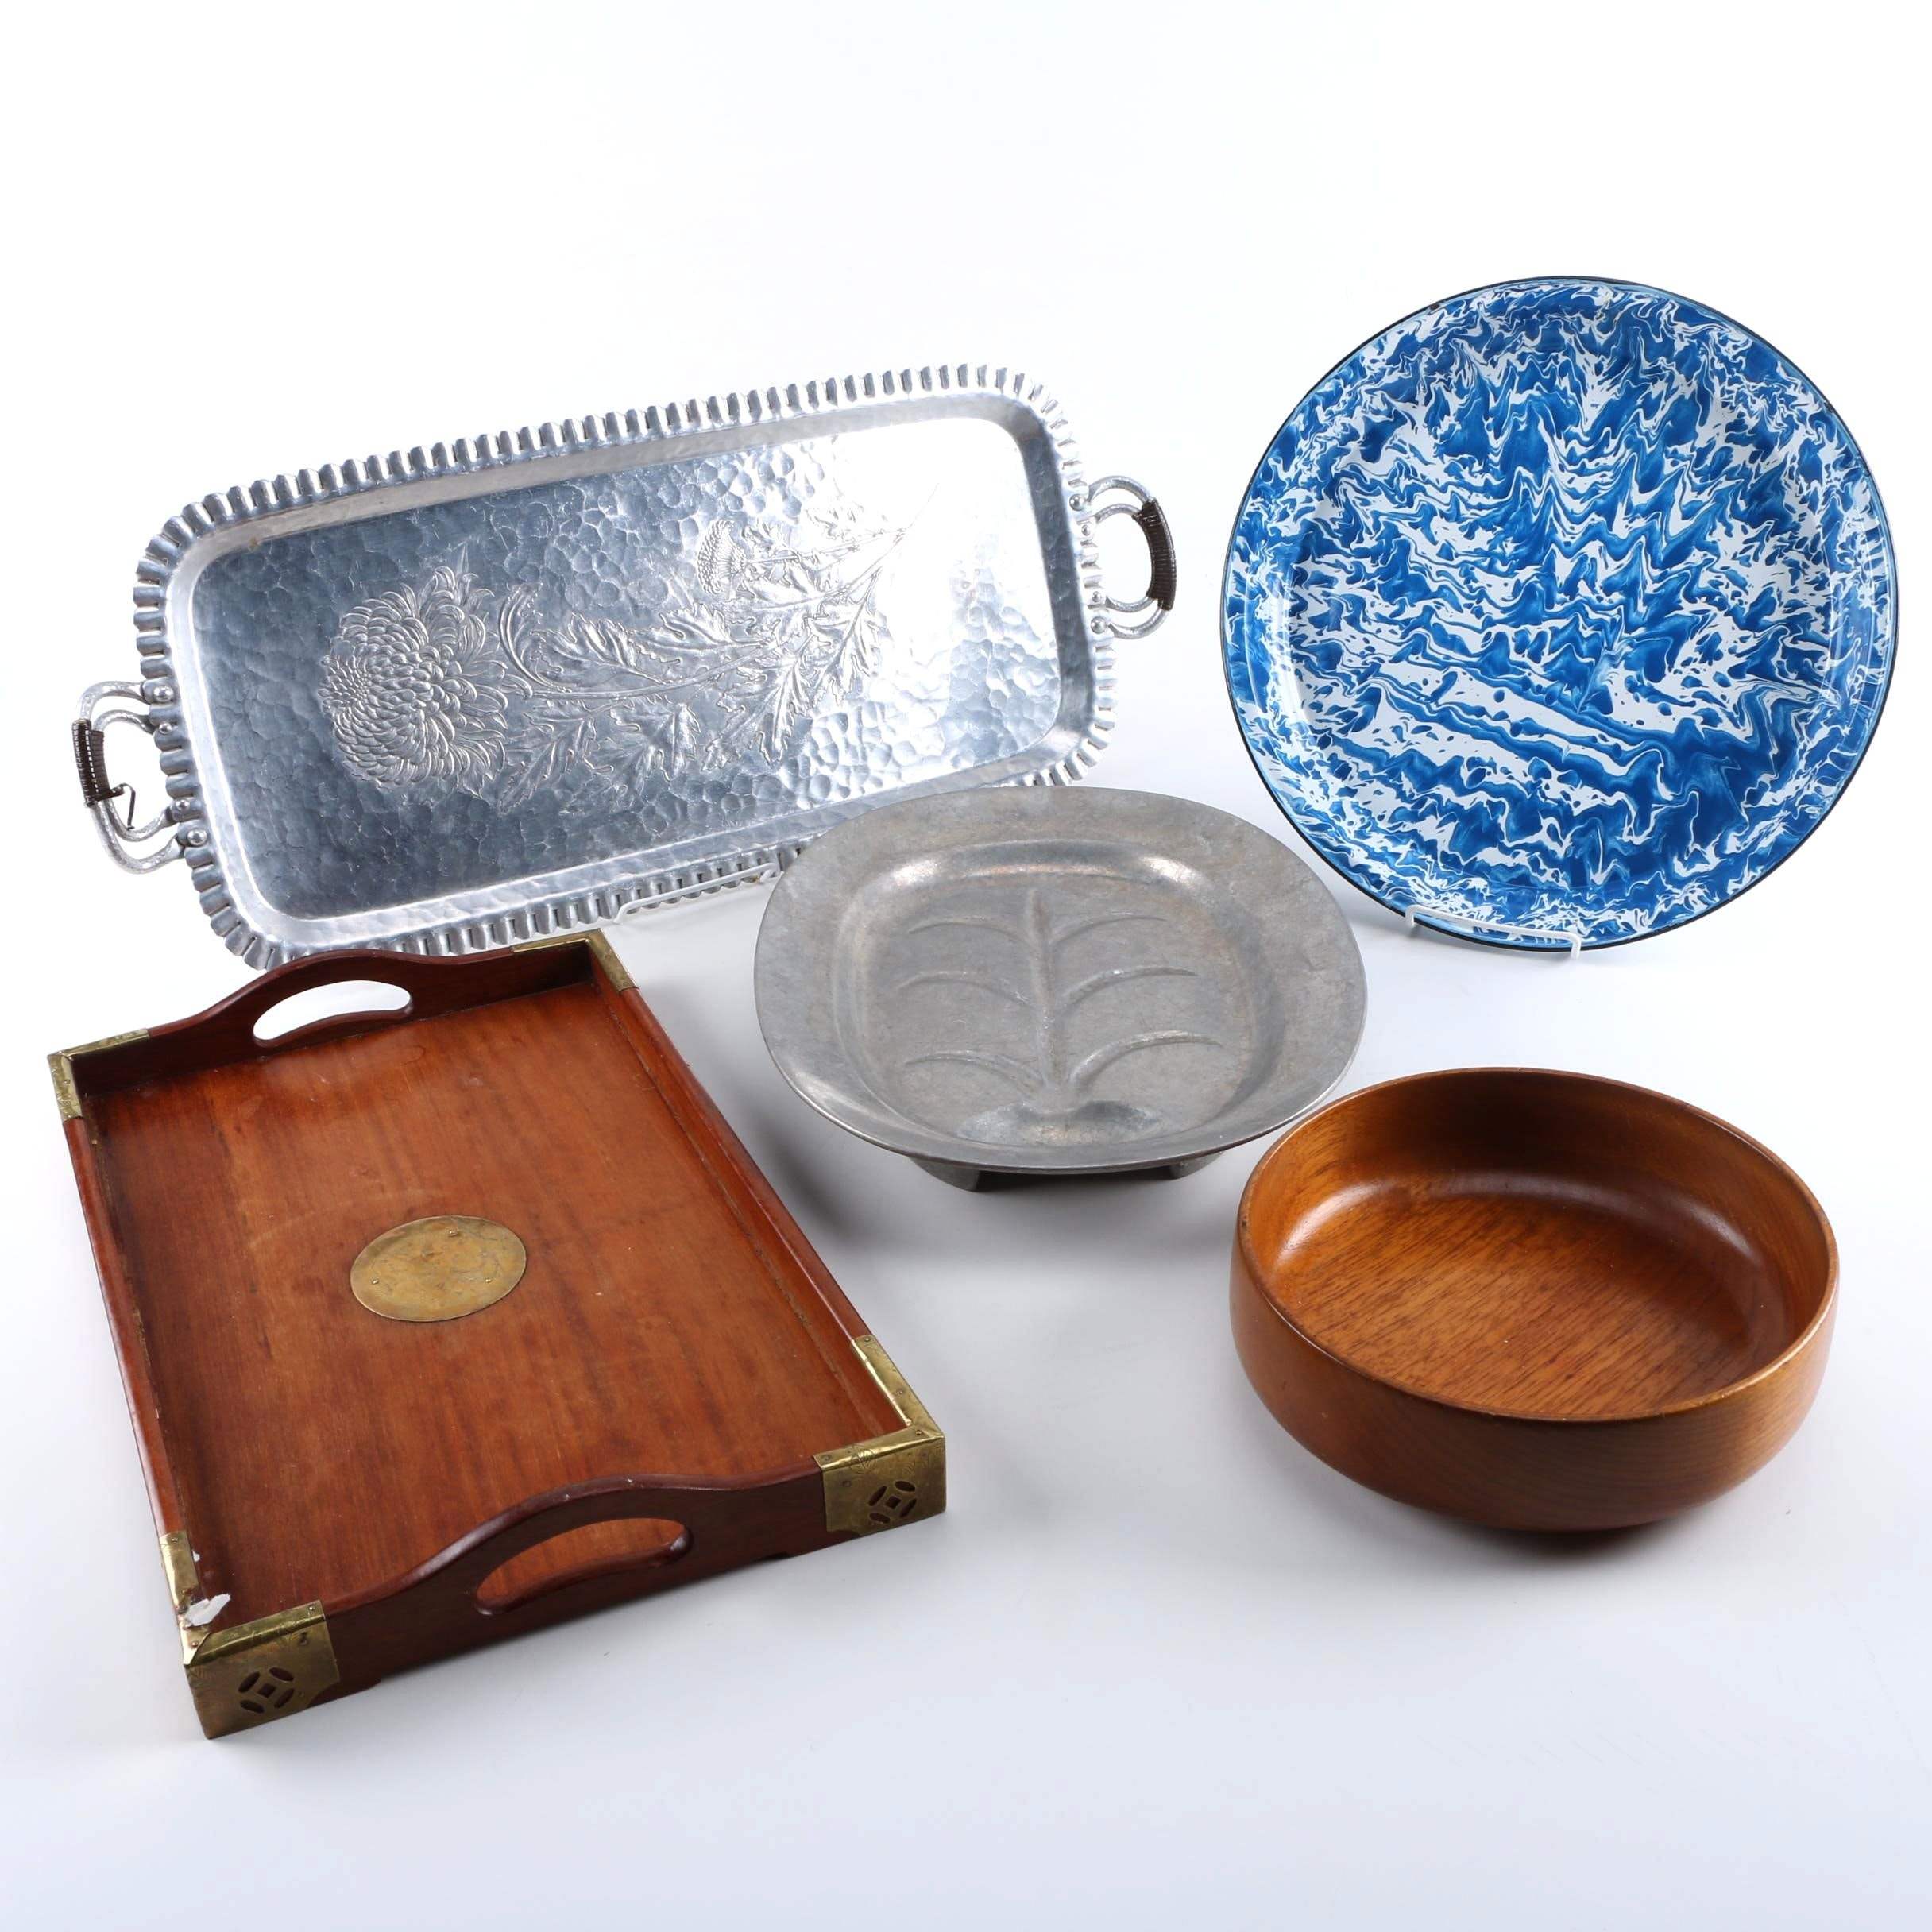 Metal and Wood Servingware